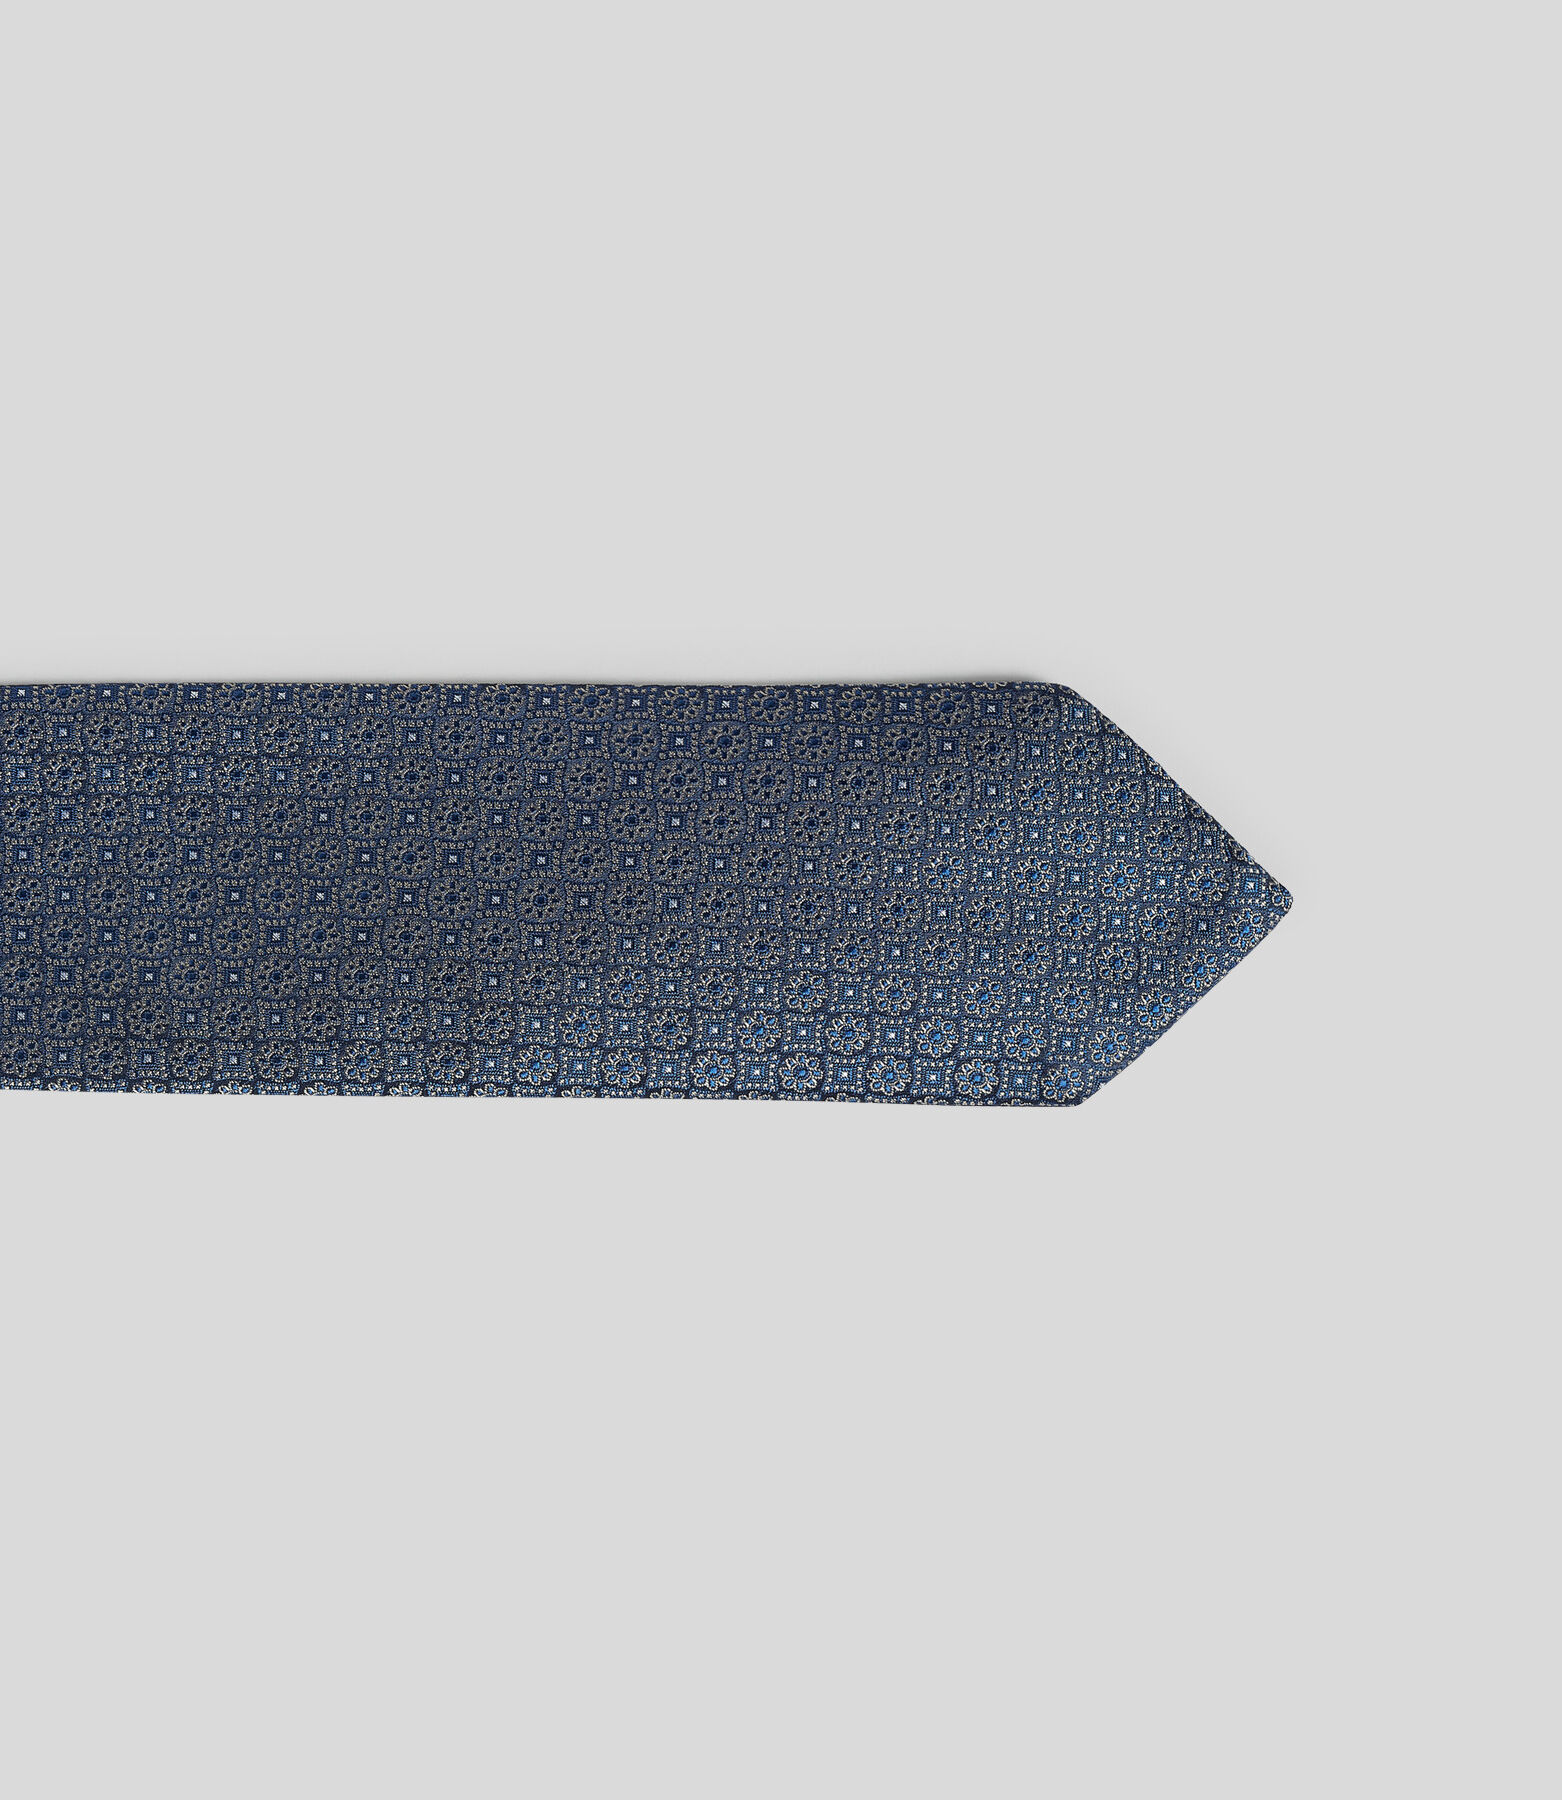 Cravate Bleu Marine